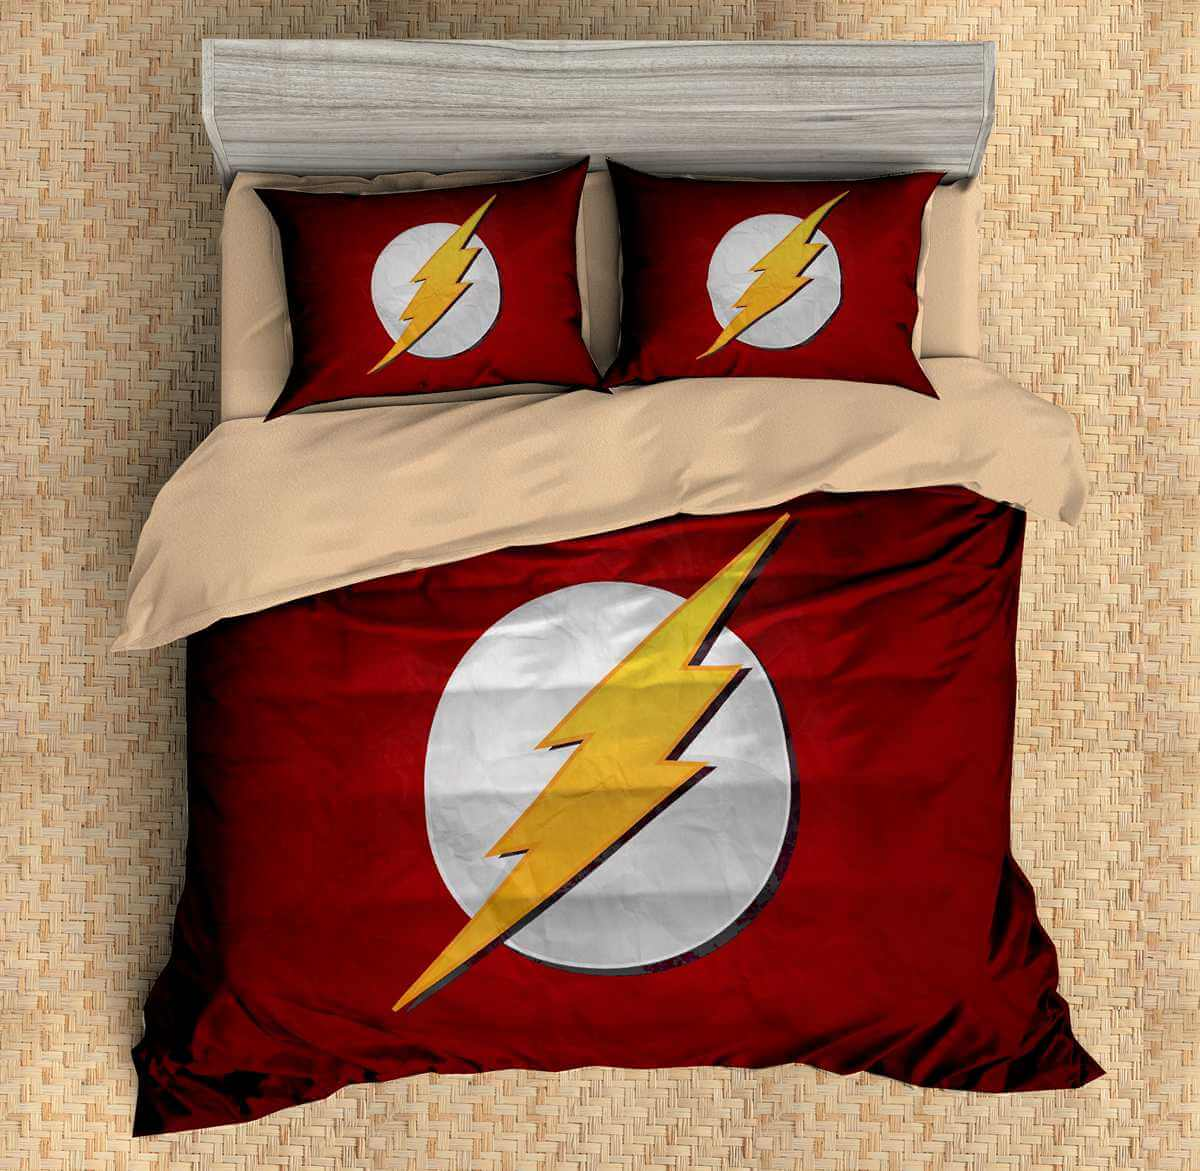 3D Customize The Flash Bedding Set Duvet Cover Set Bedroom